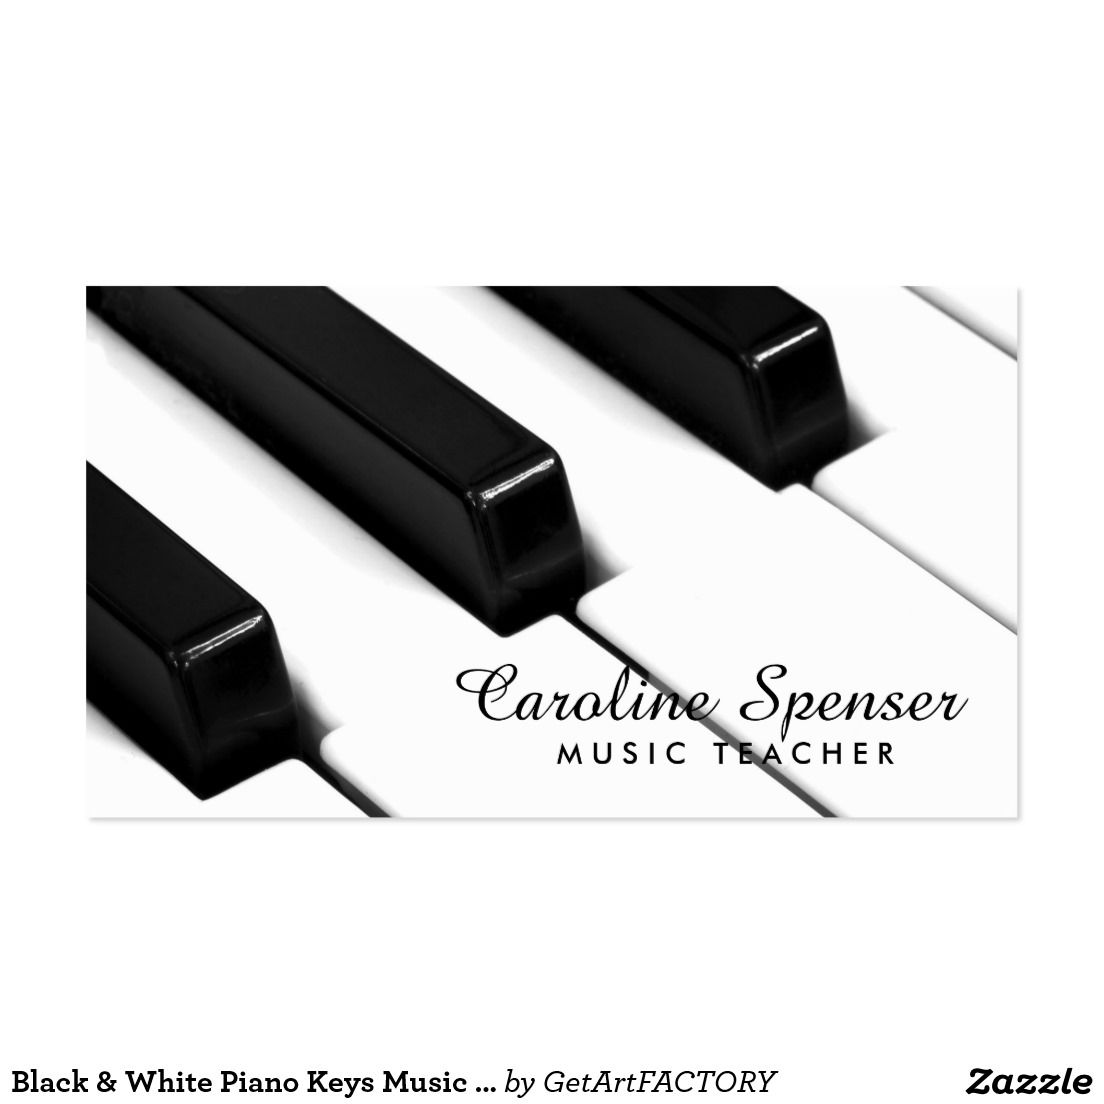 Black & White Piano Keys Music Teacher Card | White piano, Piano ...